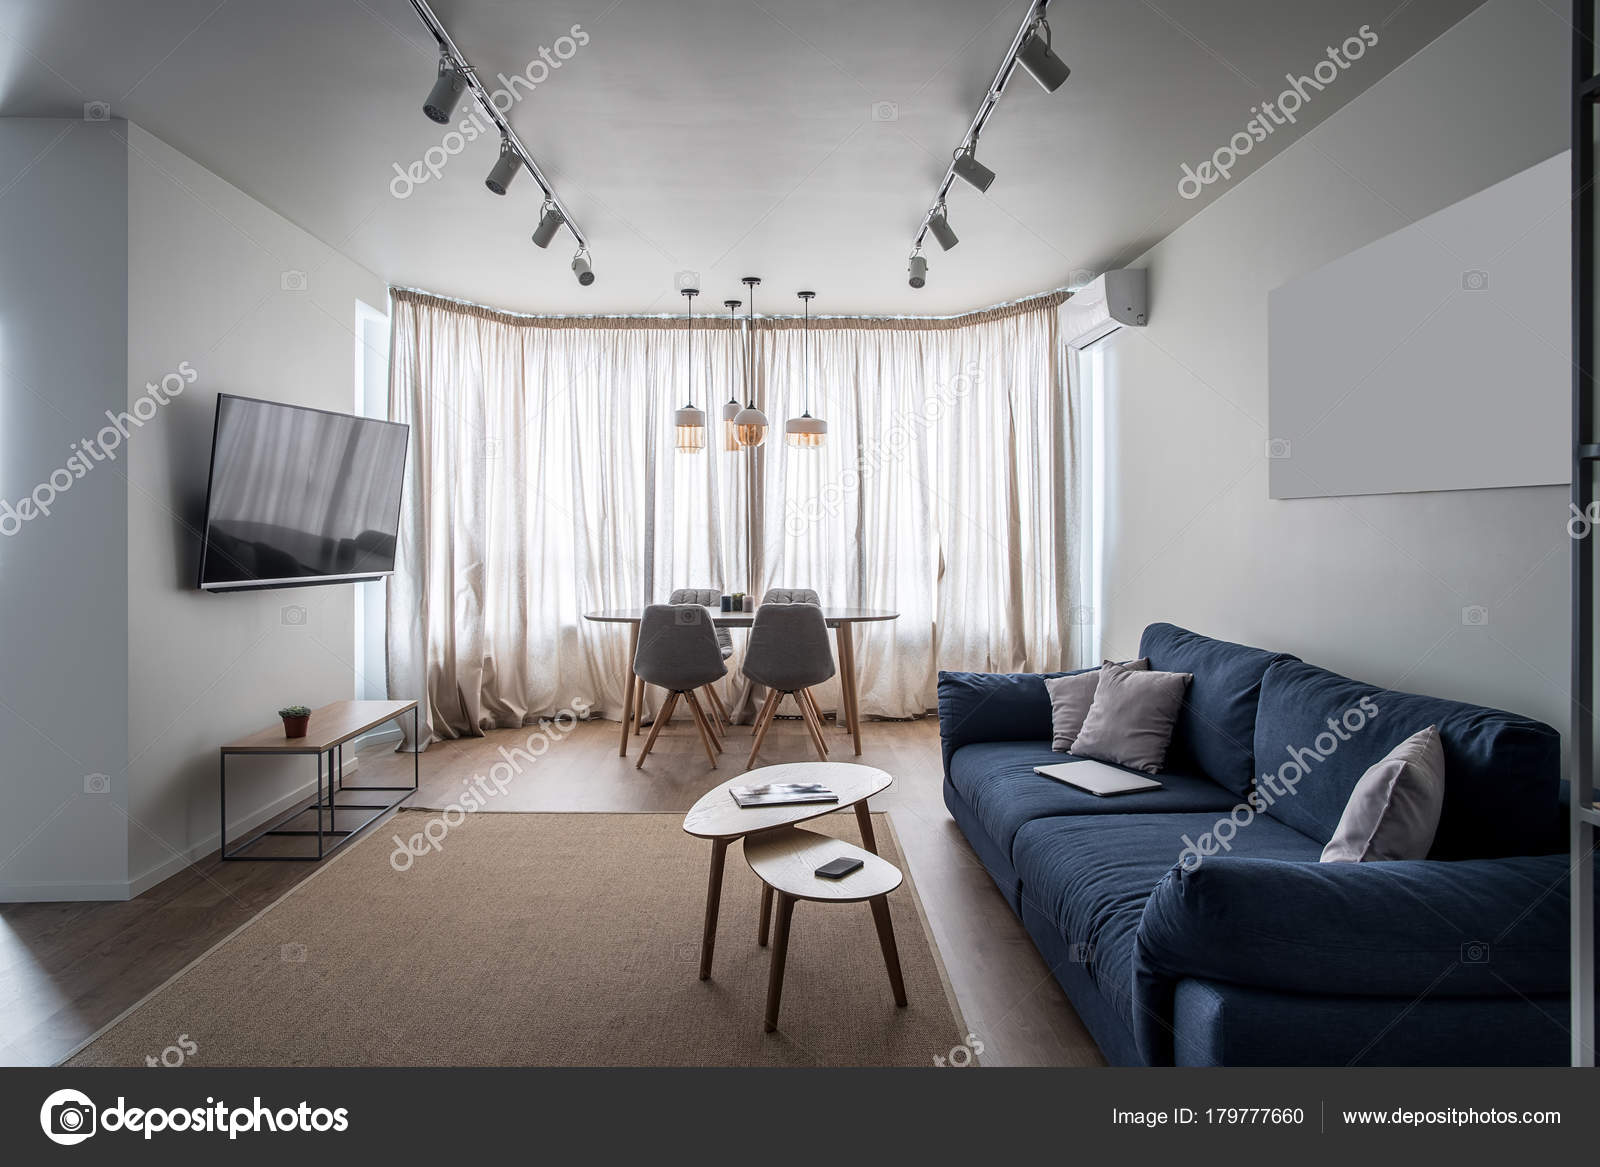 depositphotos_179777660-stock-photo-interior-in-modern-style